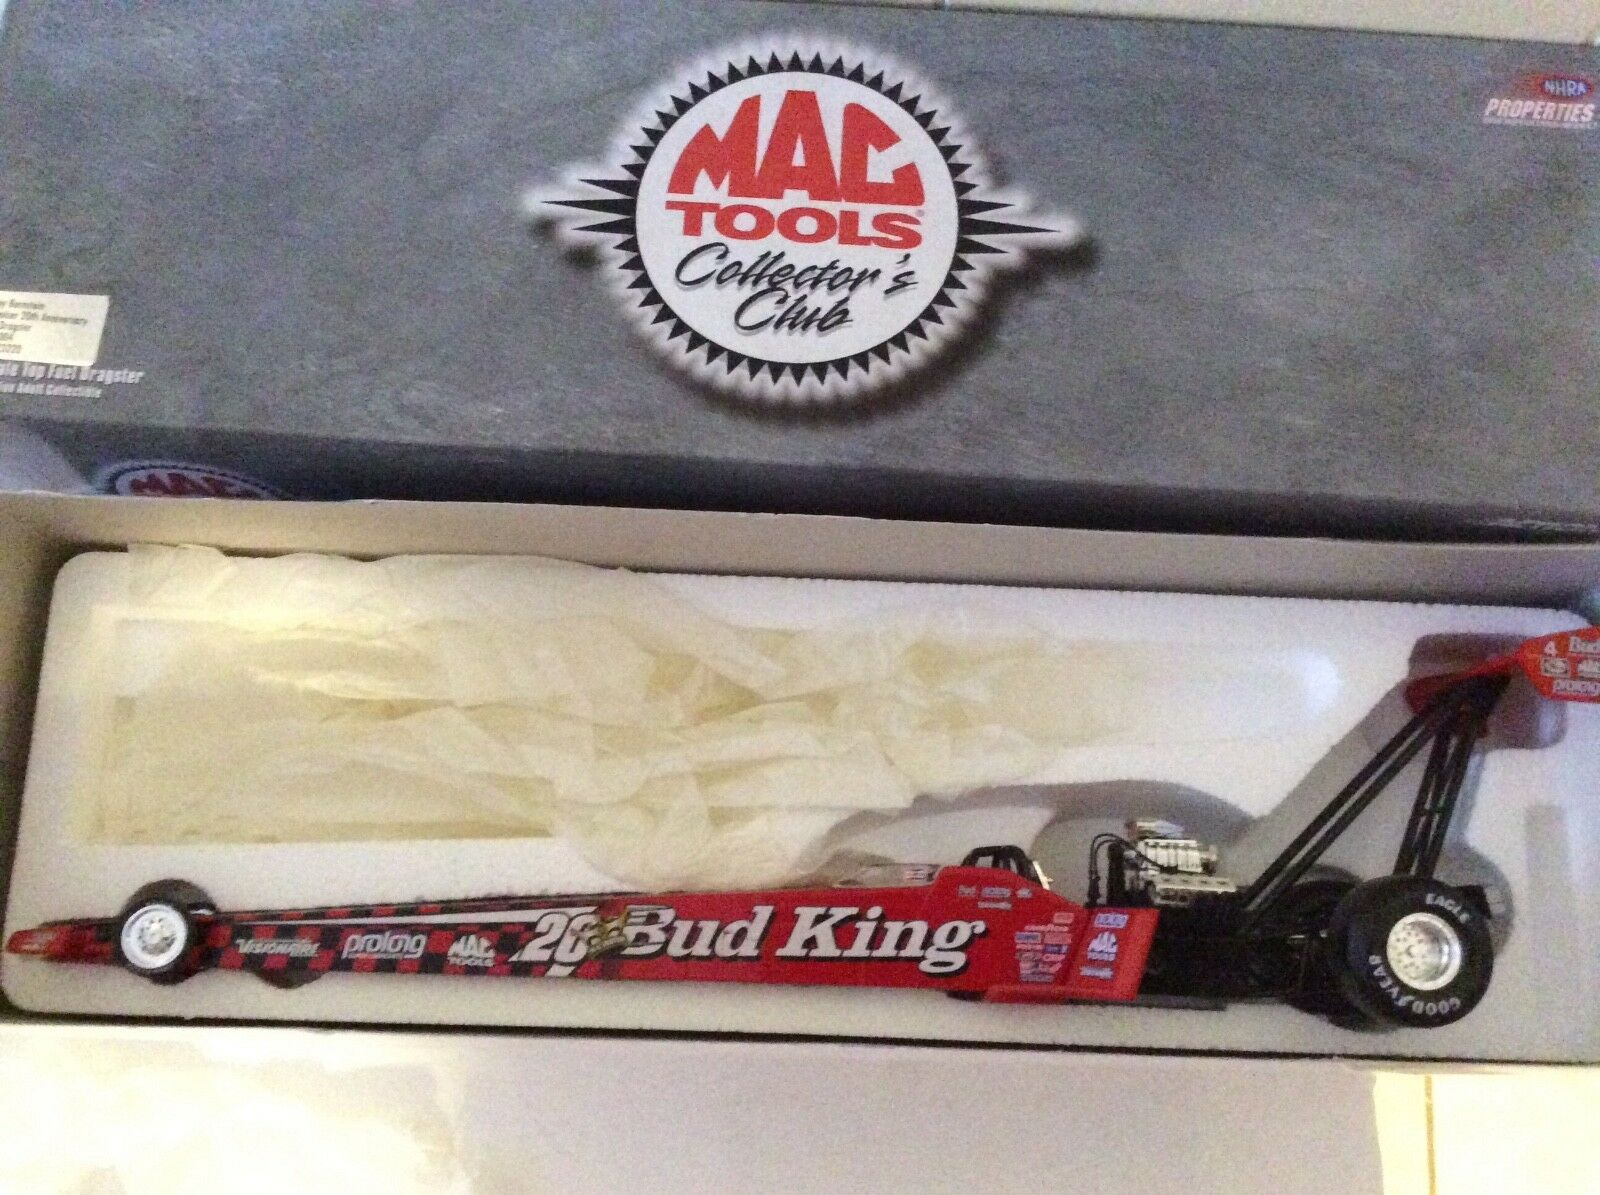 BUDWEISER KING TOP FUEL 1 24 action 1999 Mac tools NHRA dragster 20th anniversar